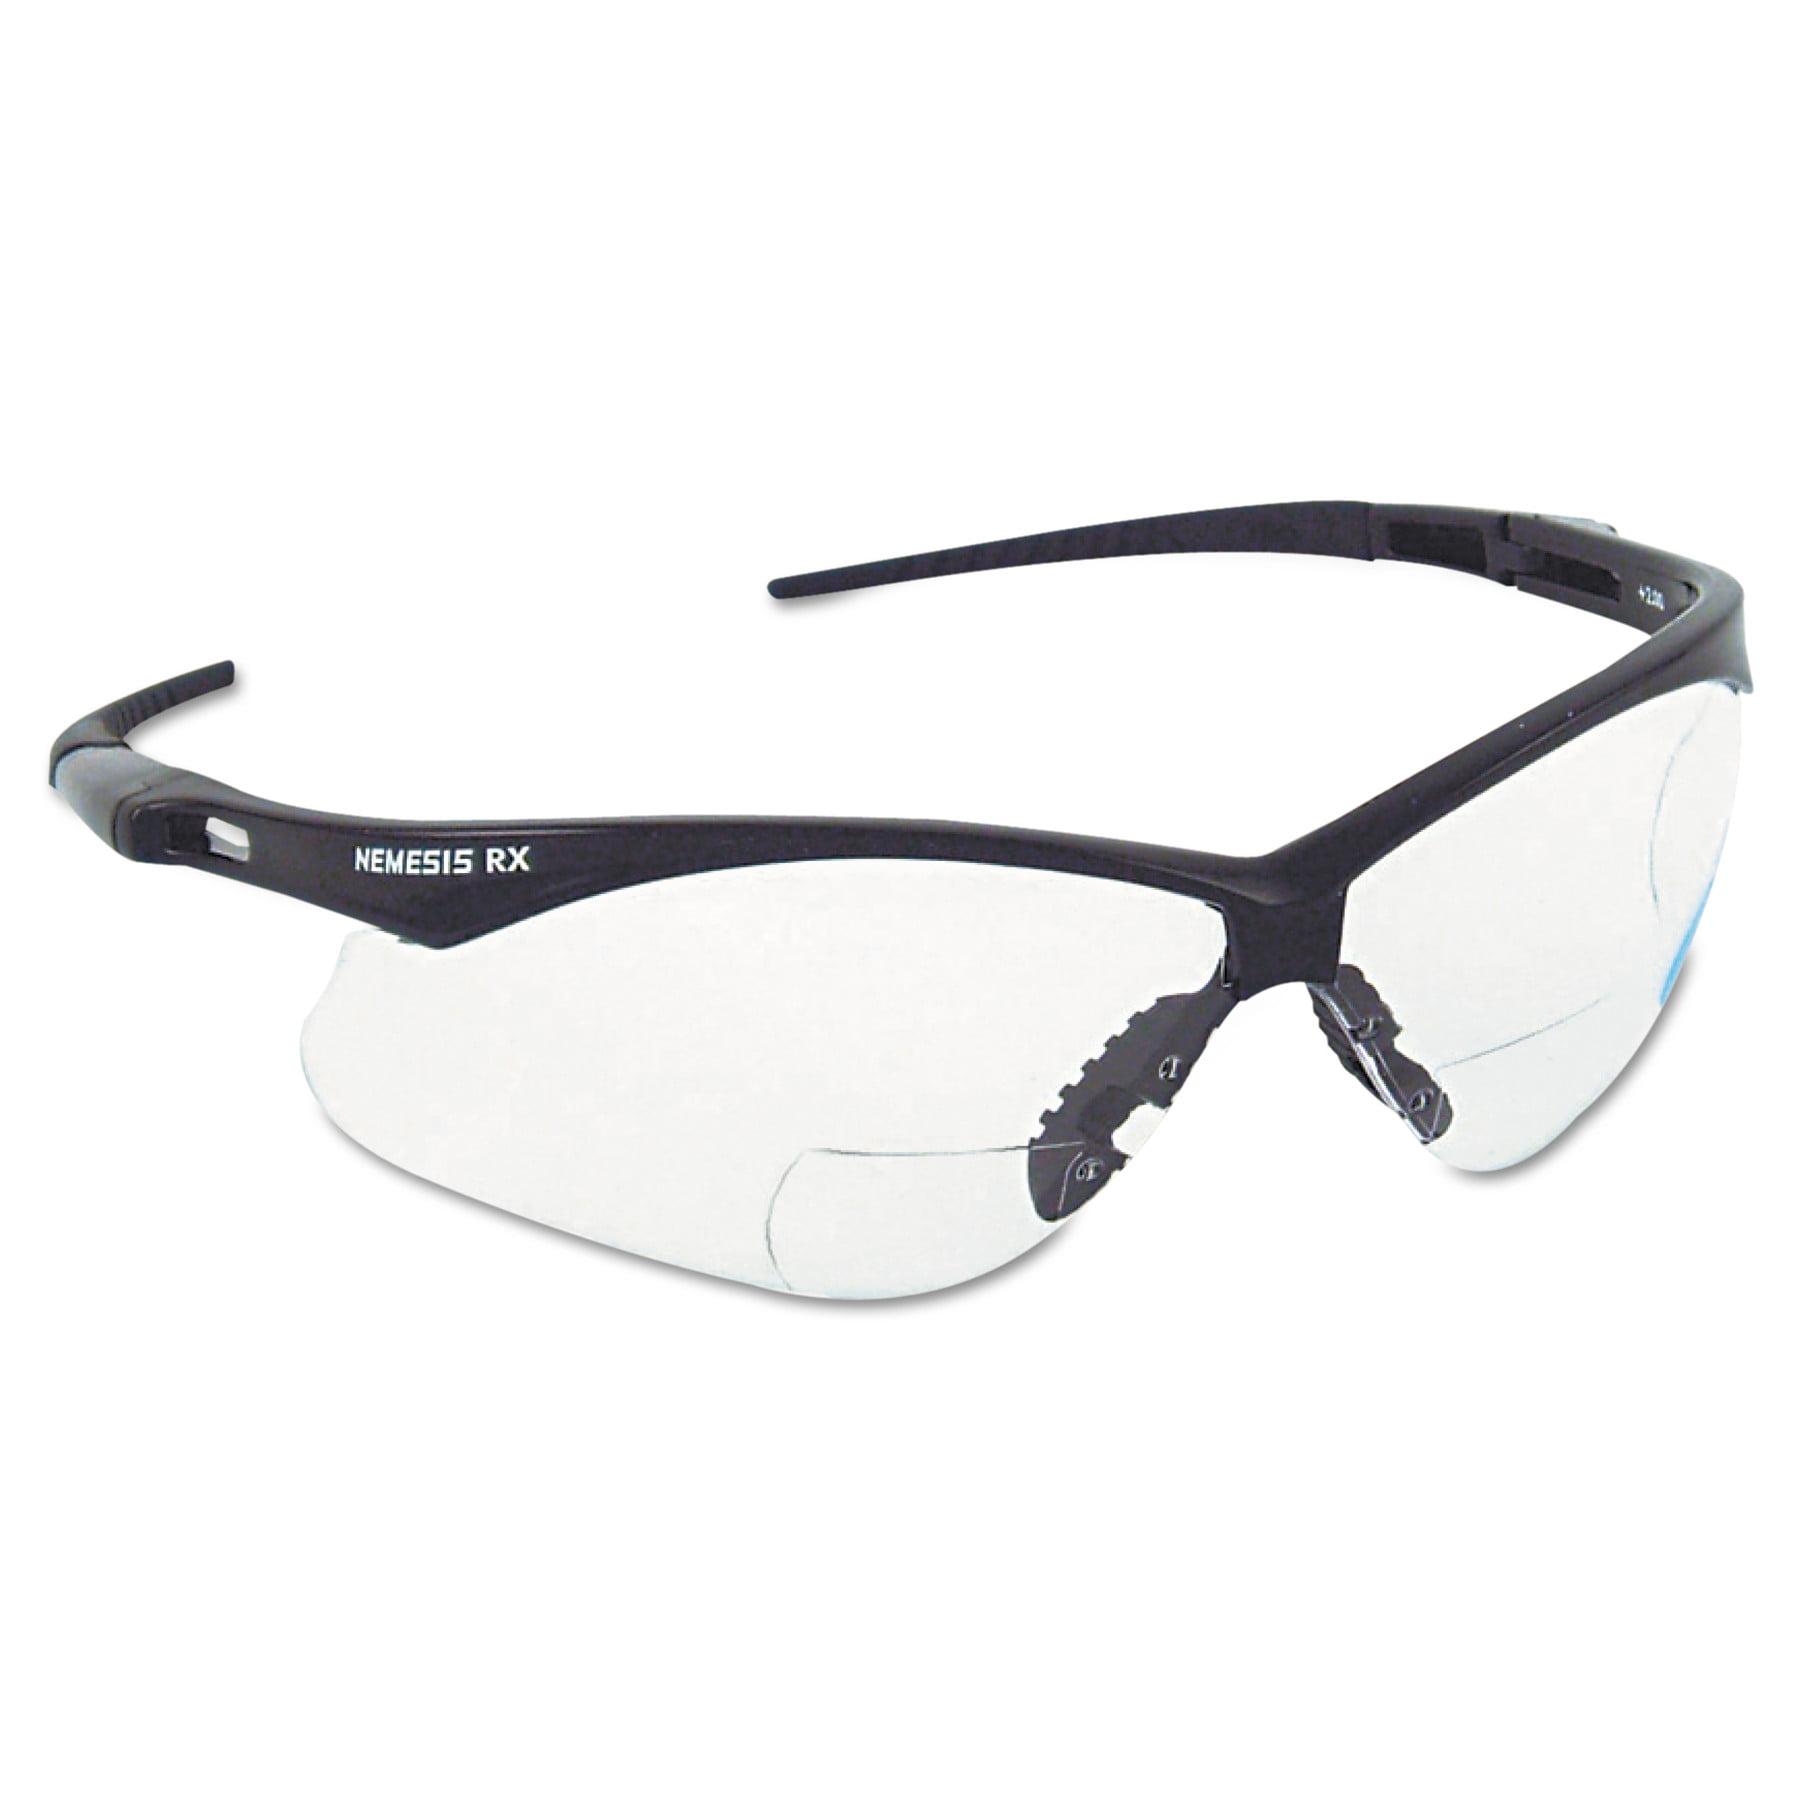 Jackson Safety* V60 Nemesis Rx Reader Safety Glasses, Black Frame, Clear Lens by Kimberly Clark